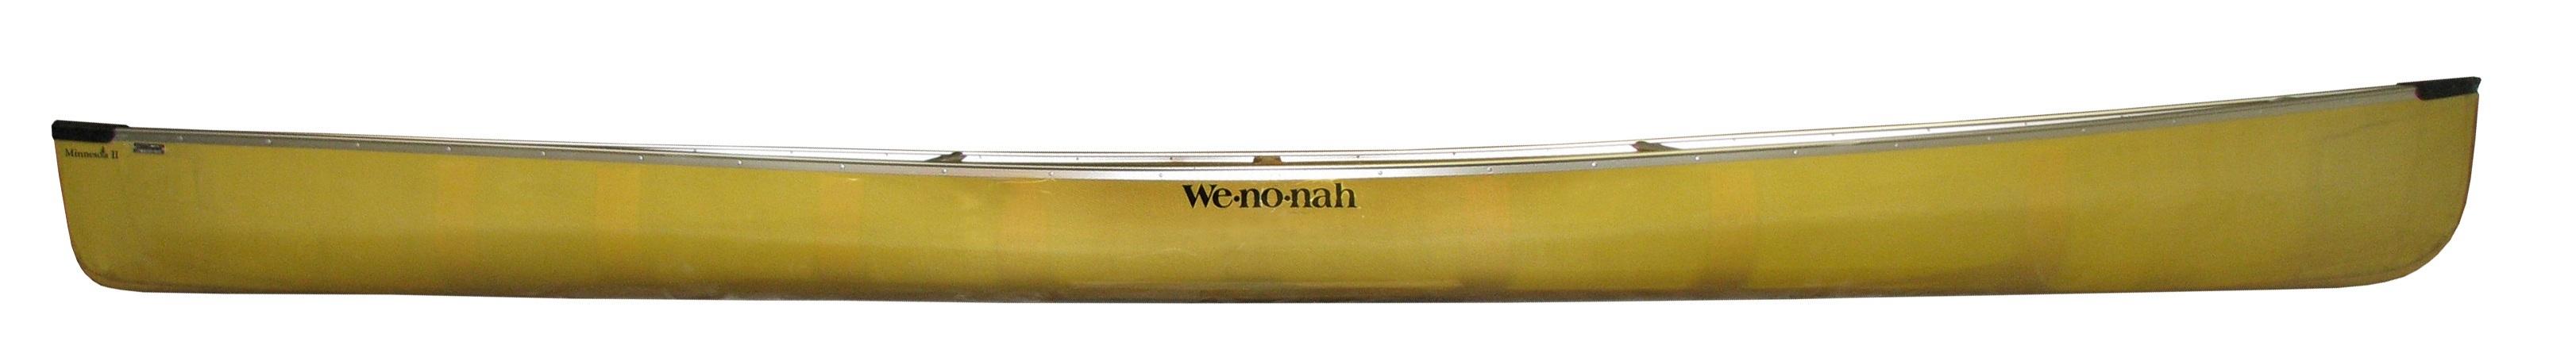 Wenonah MNII side